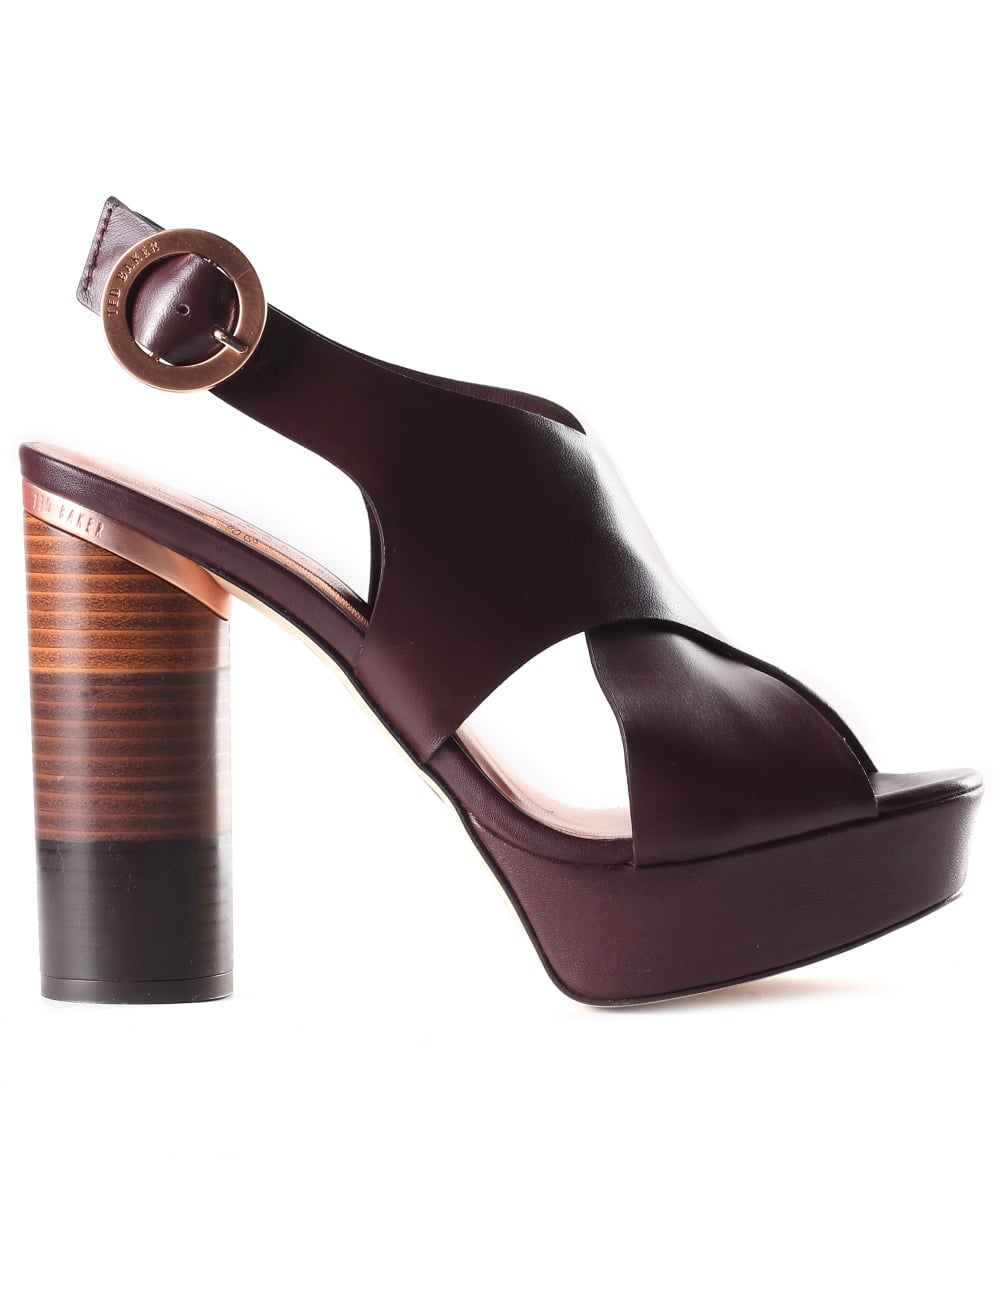 Ted Baker Women s Kamilla Cross Over Leather Block Heel Sandals db4c43a03b